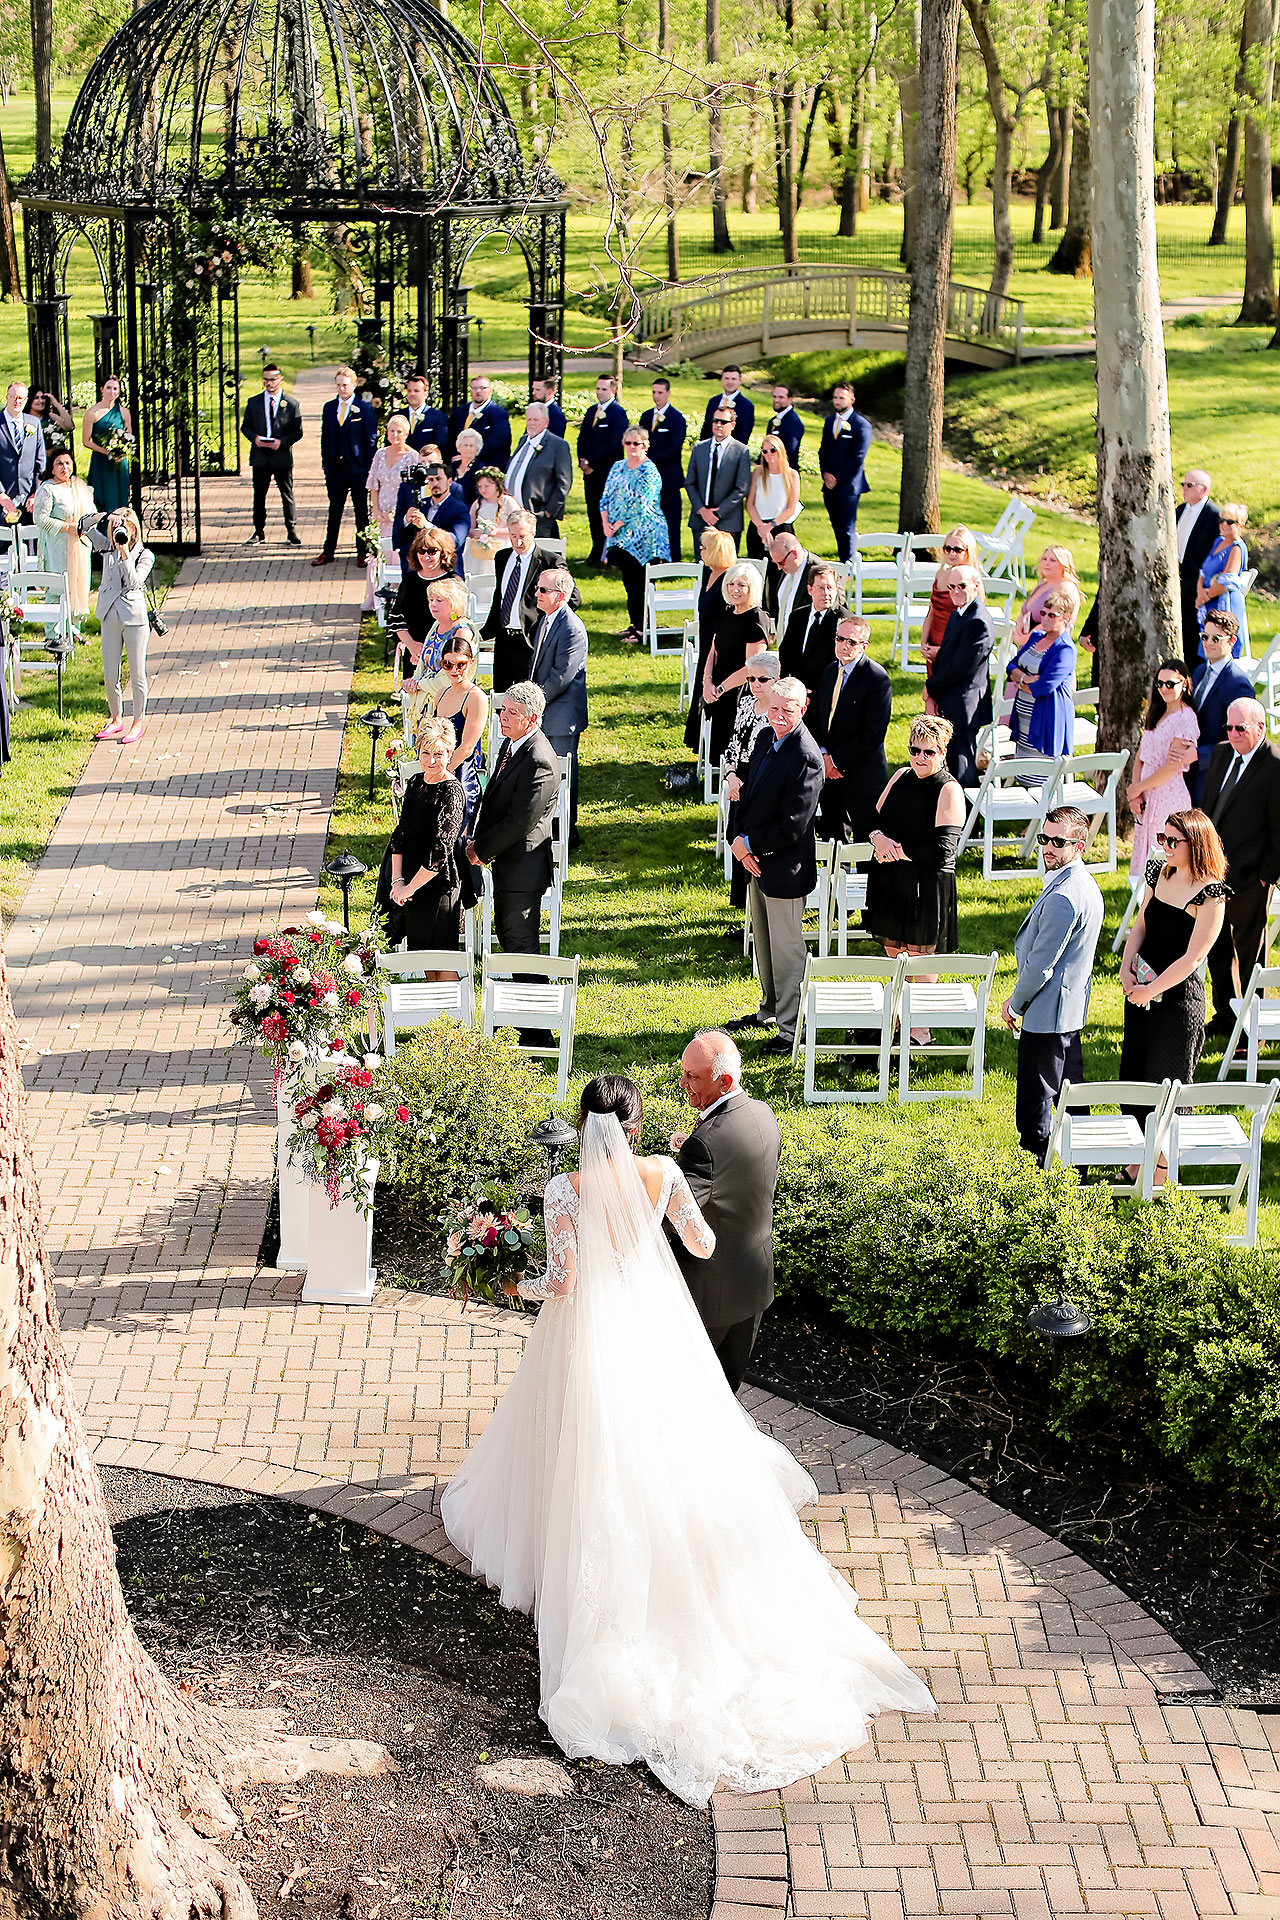 Nadia Parker Black Iris Estate Carmel Indiana Wedding May 2021 169